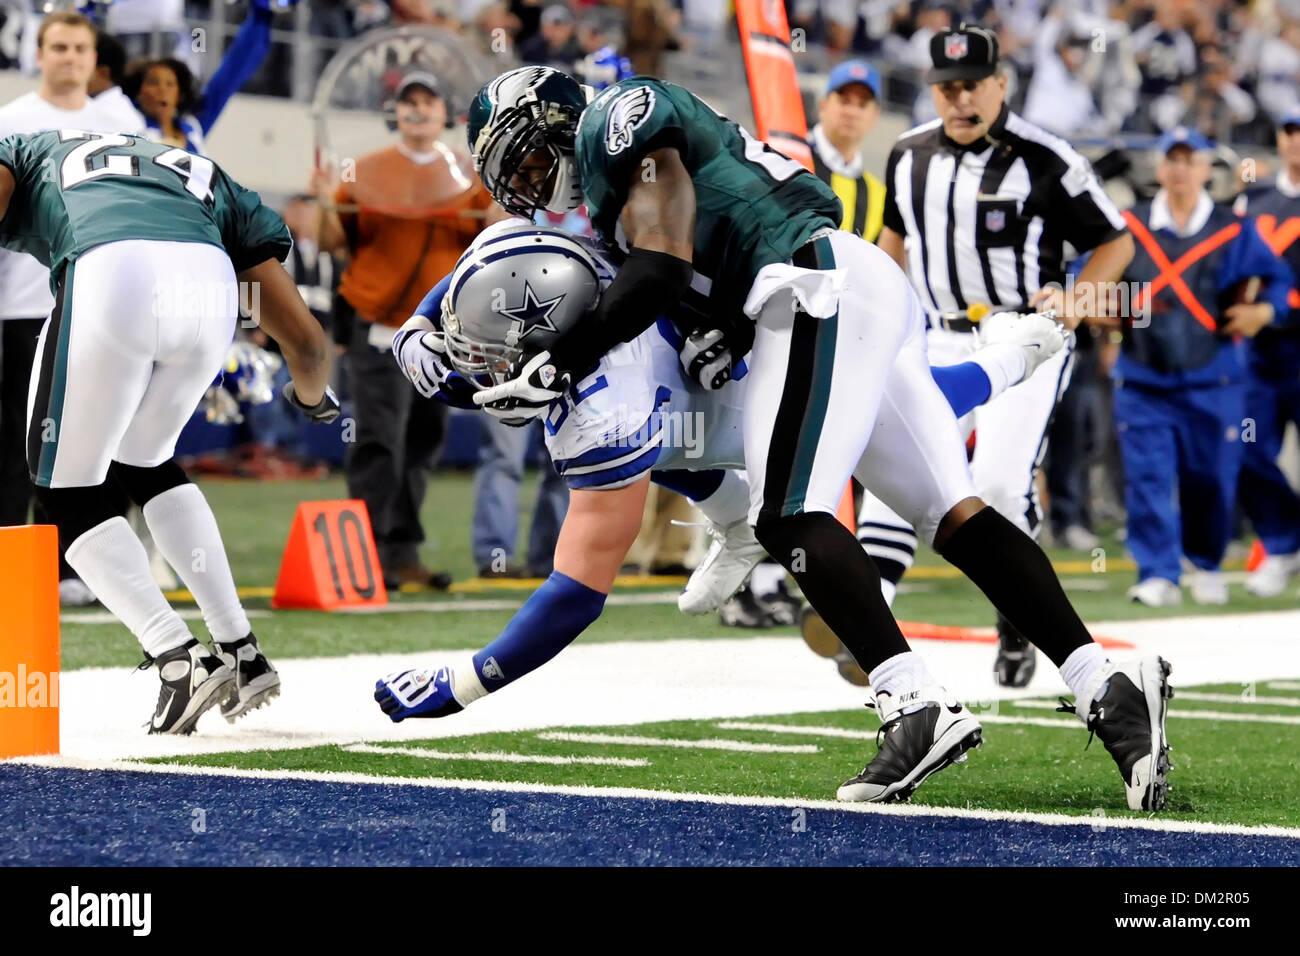 Dallas Cowboys tight end Jason Witten (82) makes a goal line